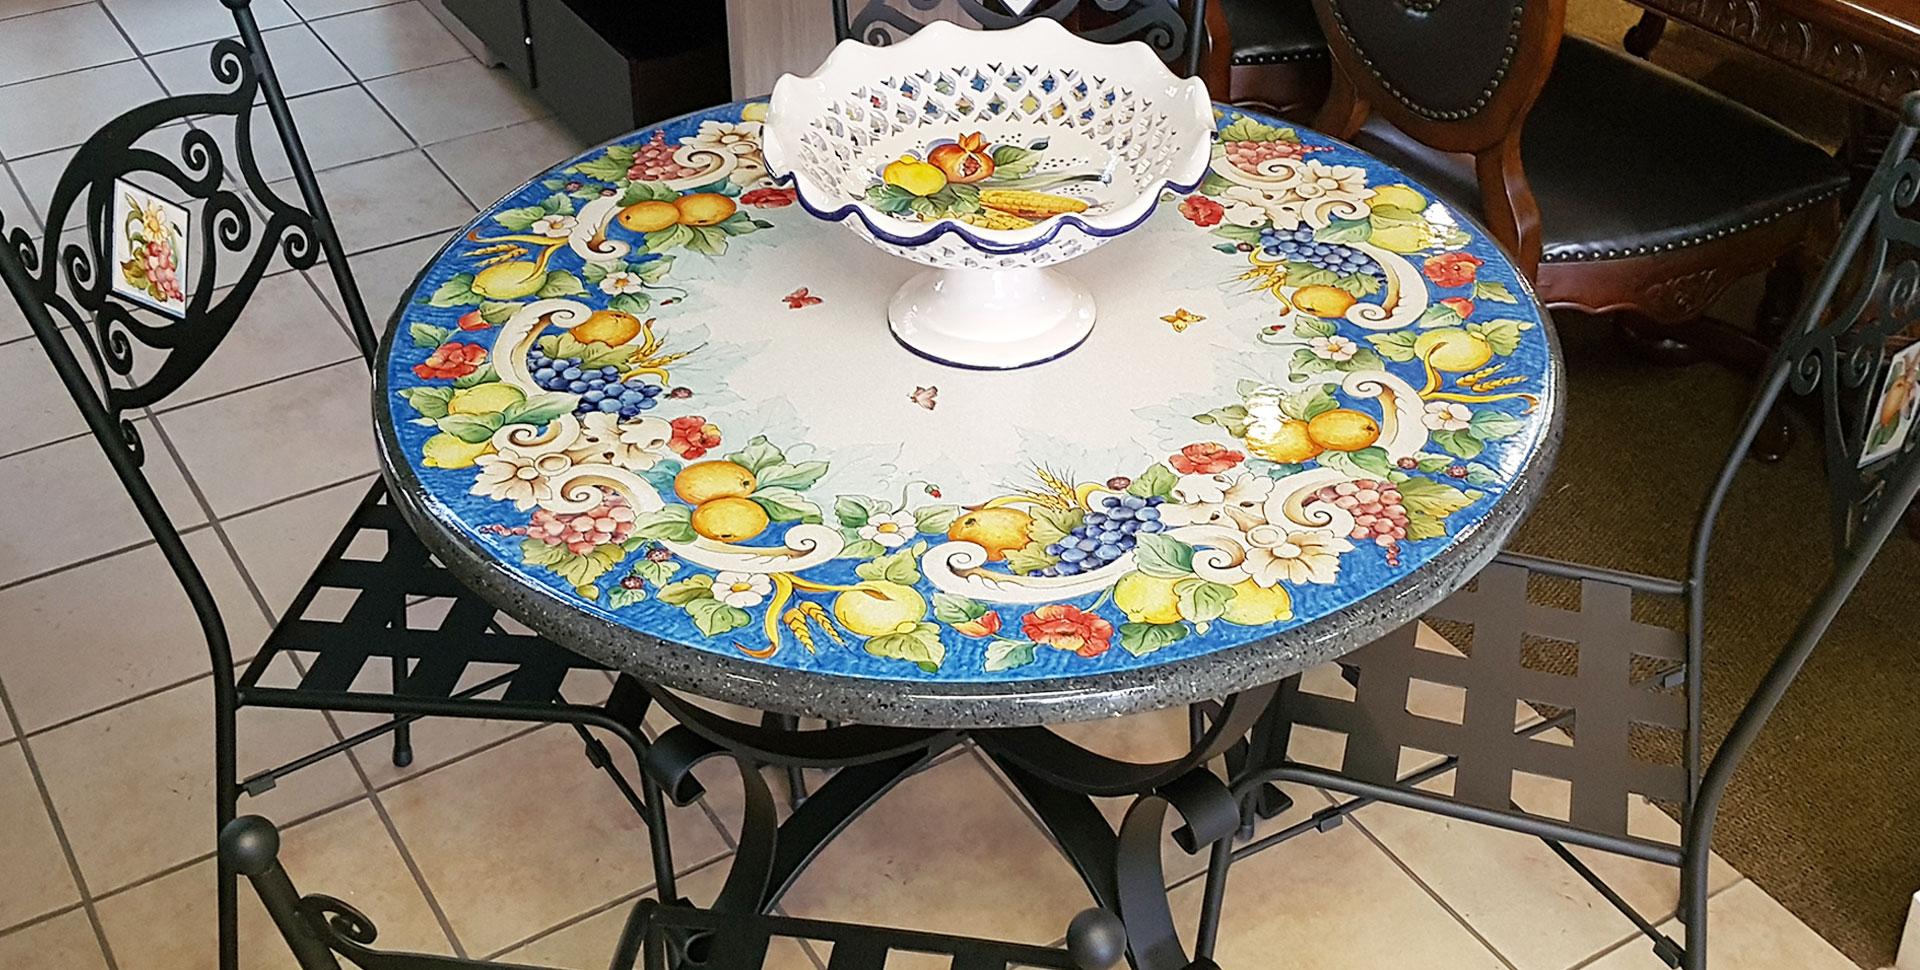 Tavoli Da Giardino Pietra Lavica.Tavolo Da Giardino Pietra Lavica 40 Fantastiche Immagini Su Tavoli